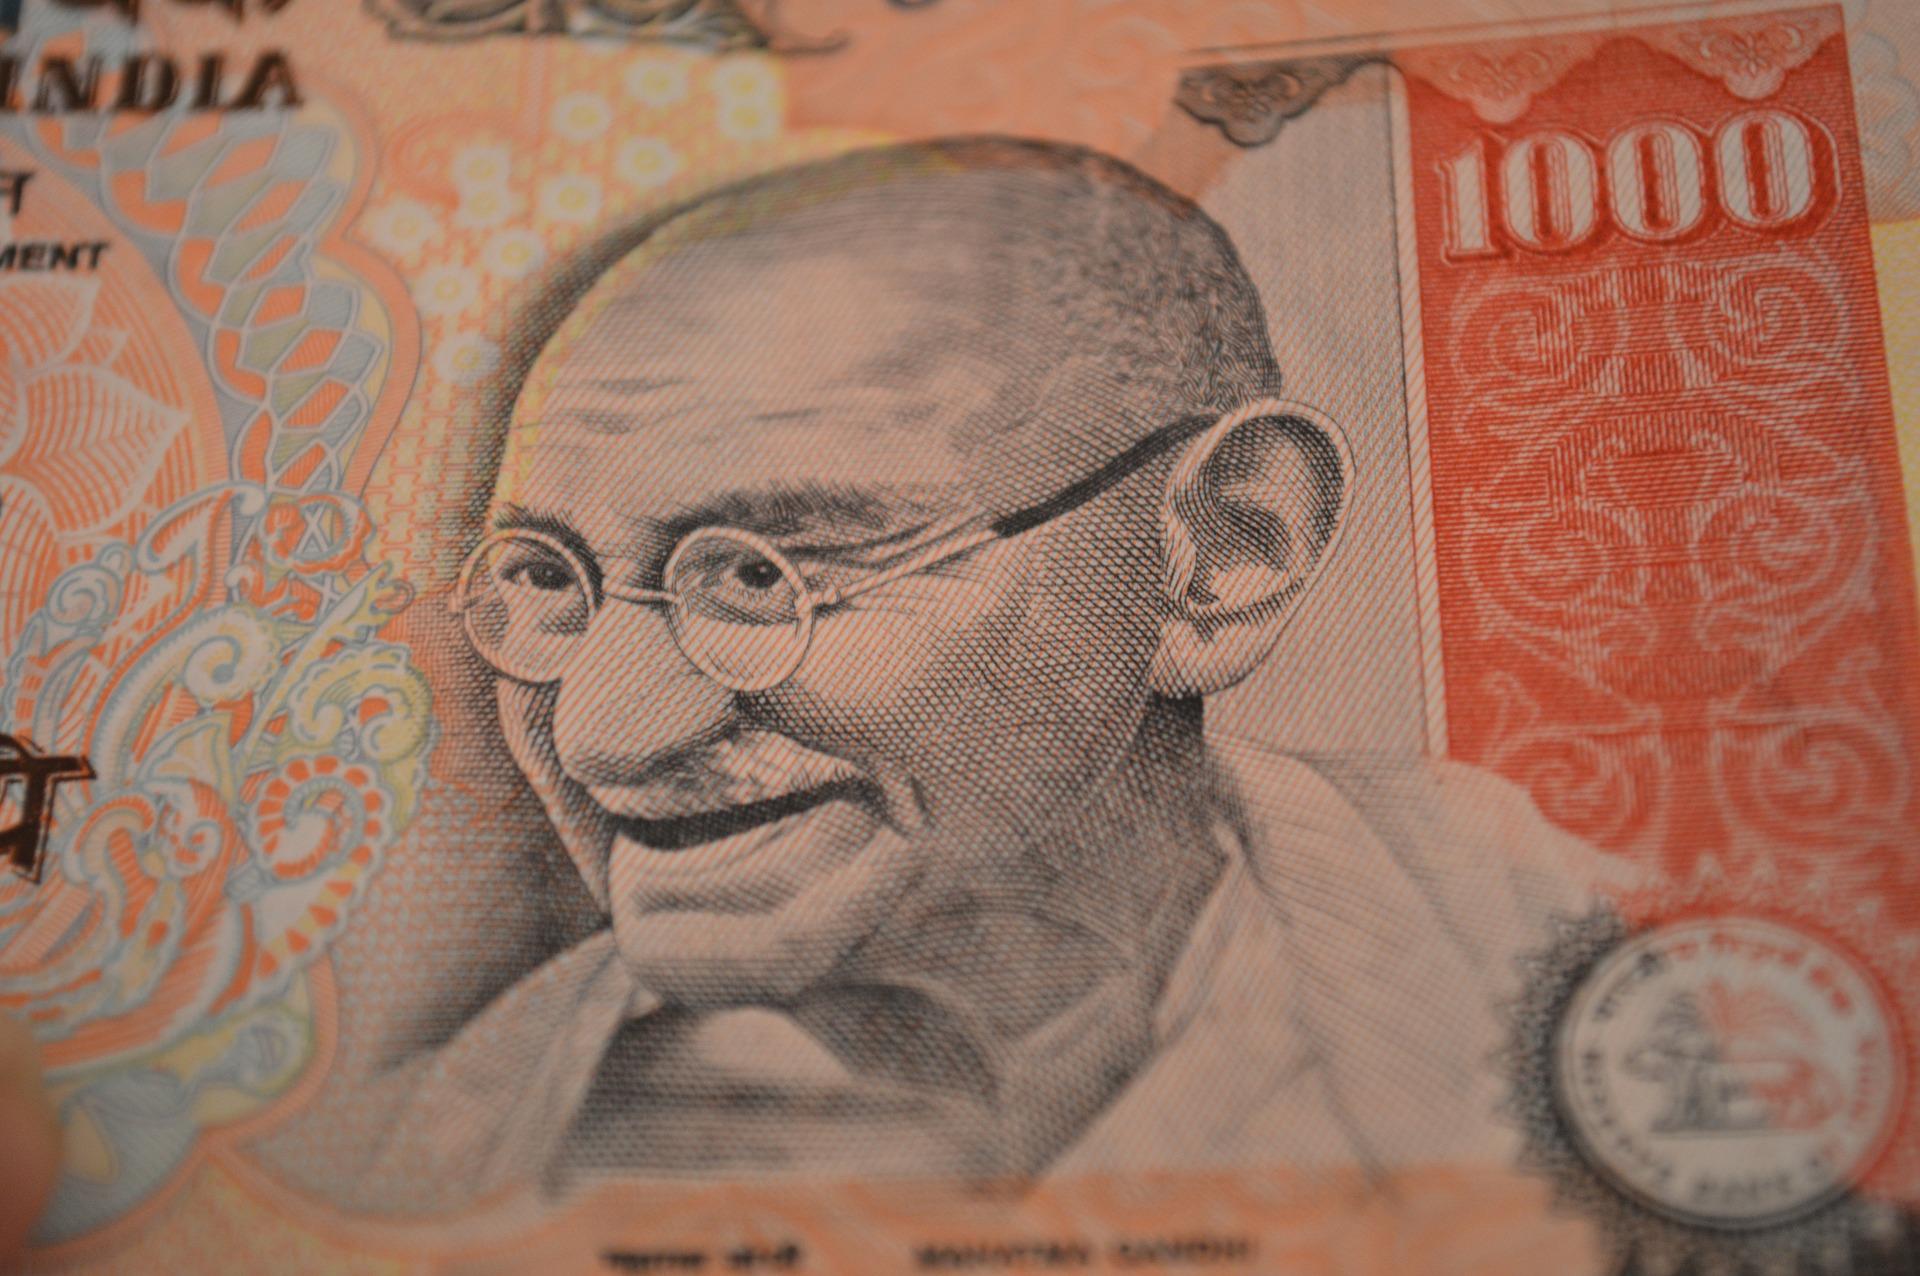 rupees 1000 rupias